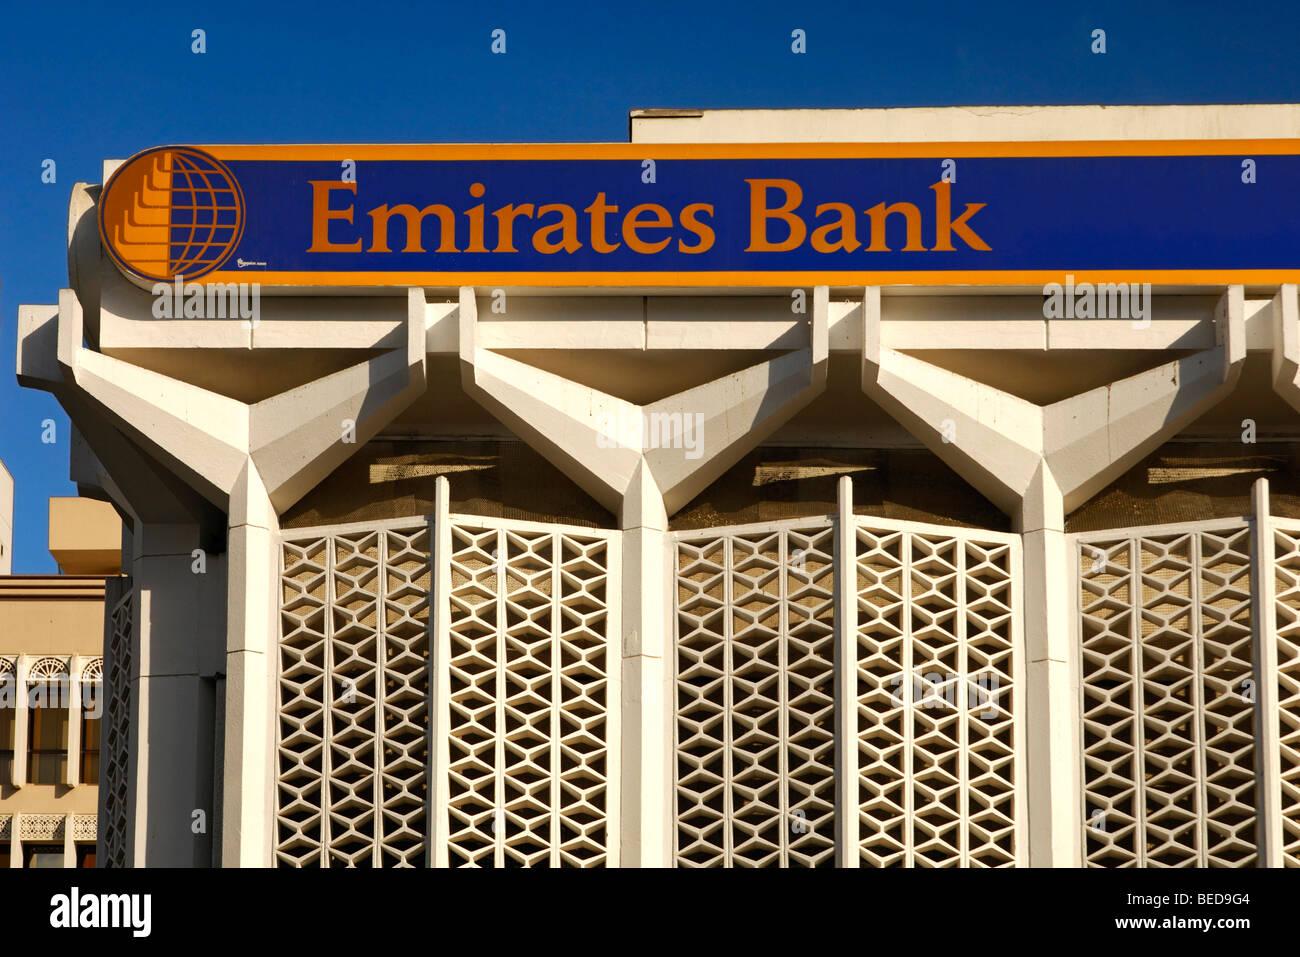 Emirates Bank branch in Bur Dubai, Dubai, United Arab Emirates - Stock Image